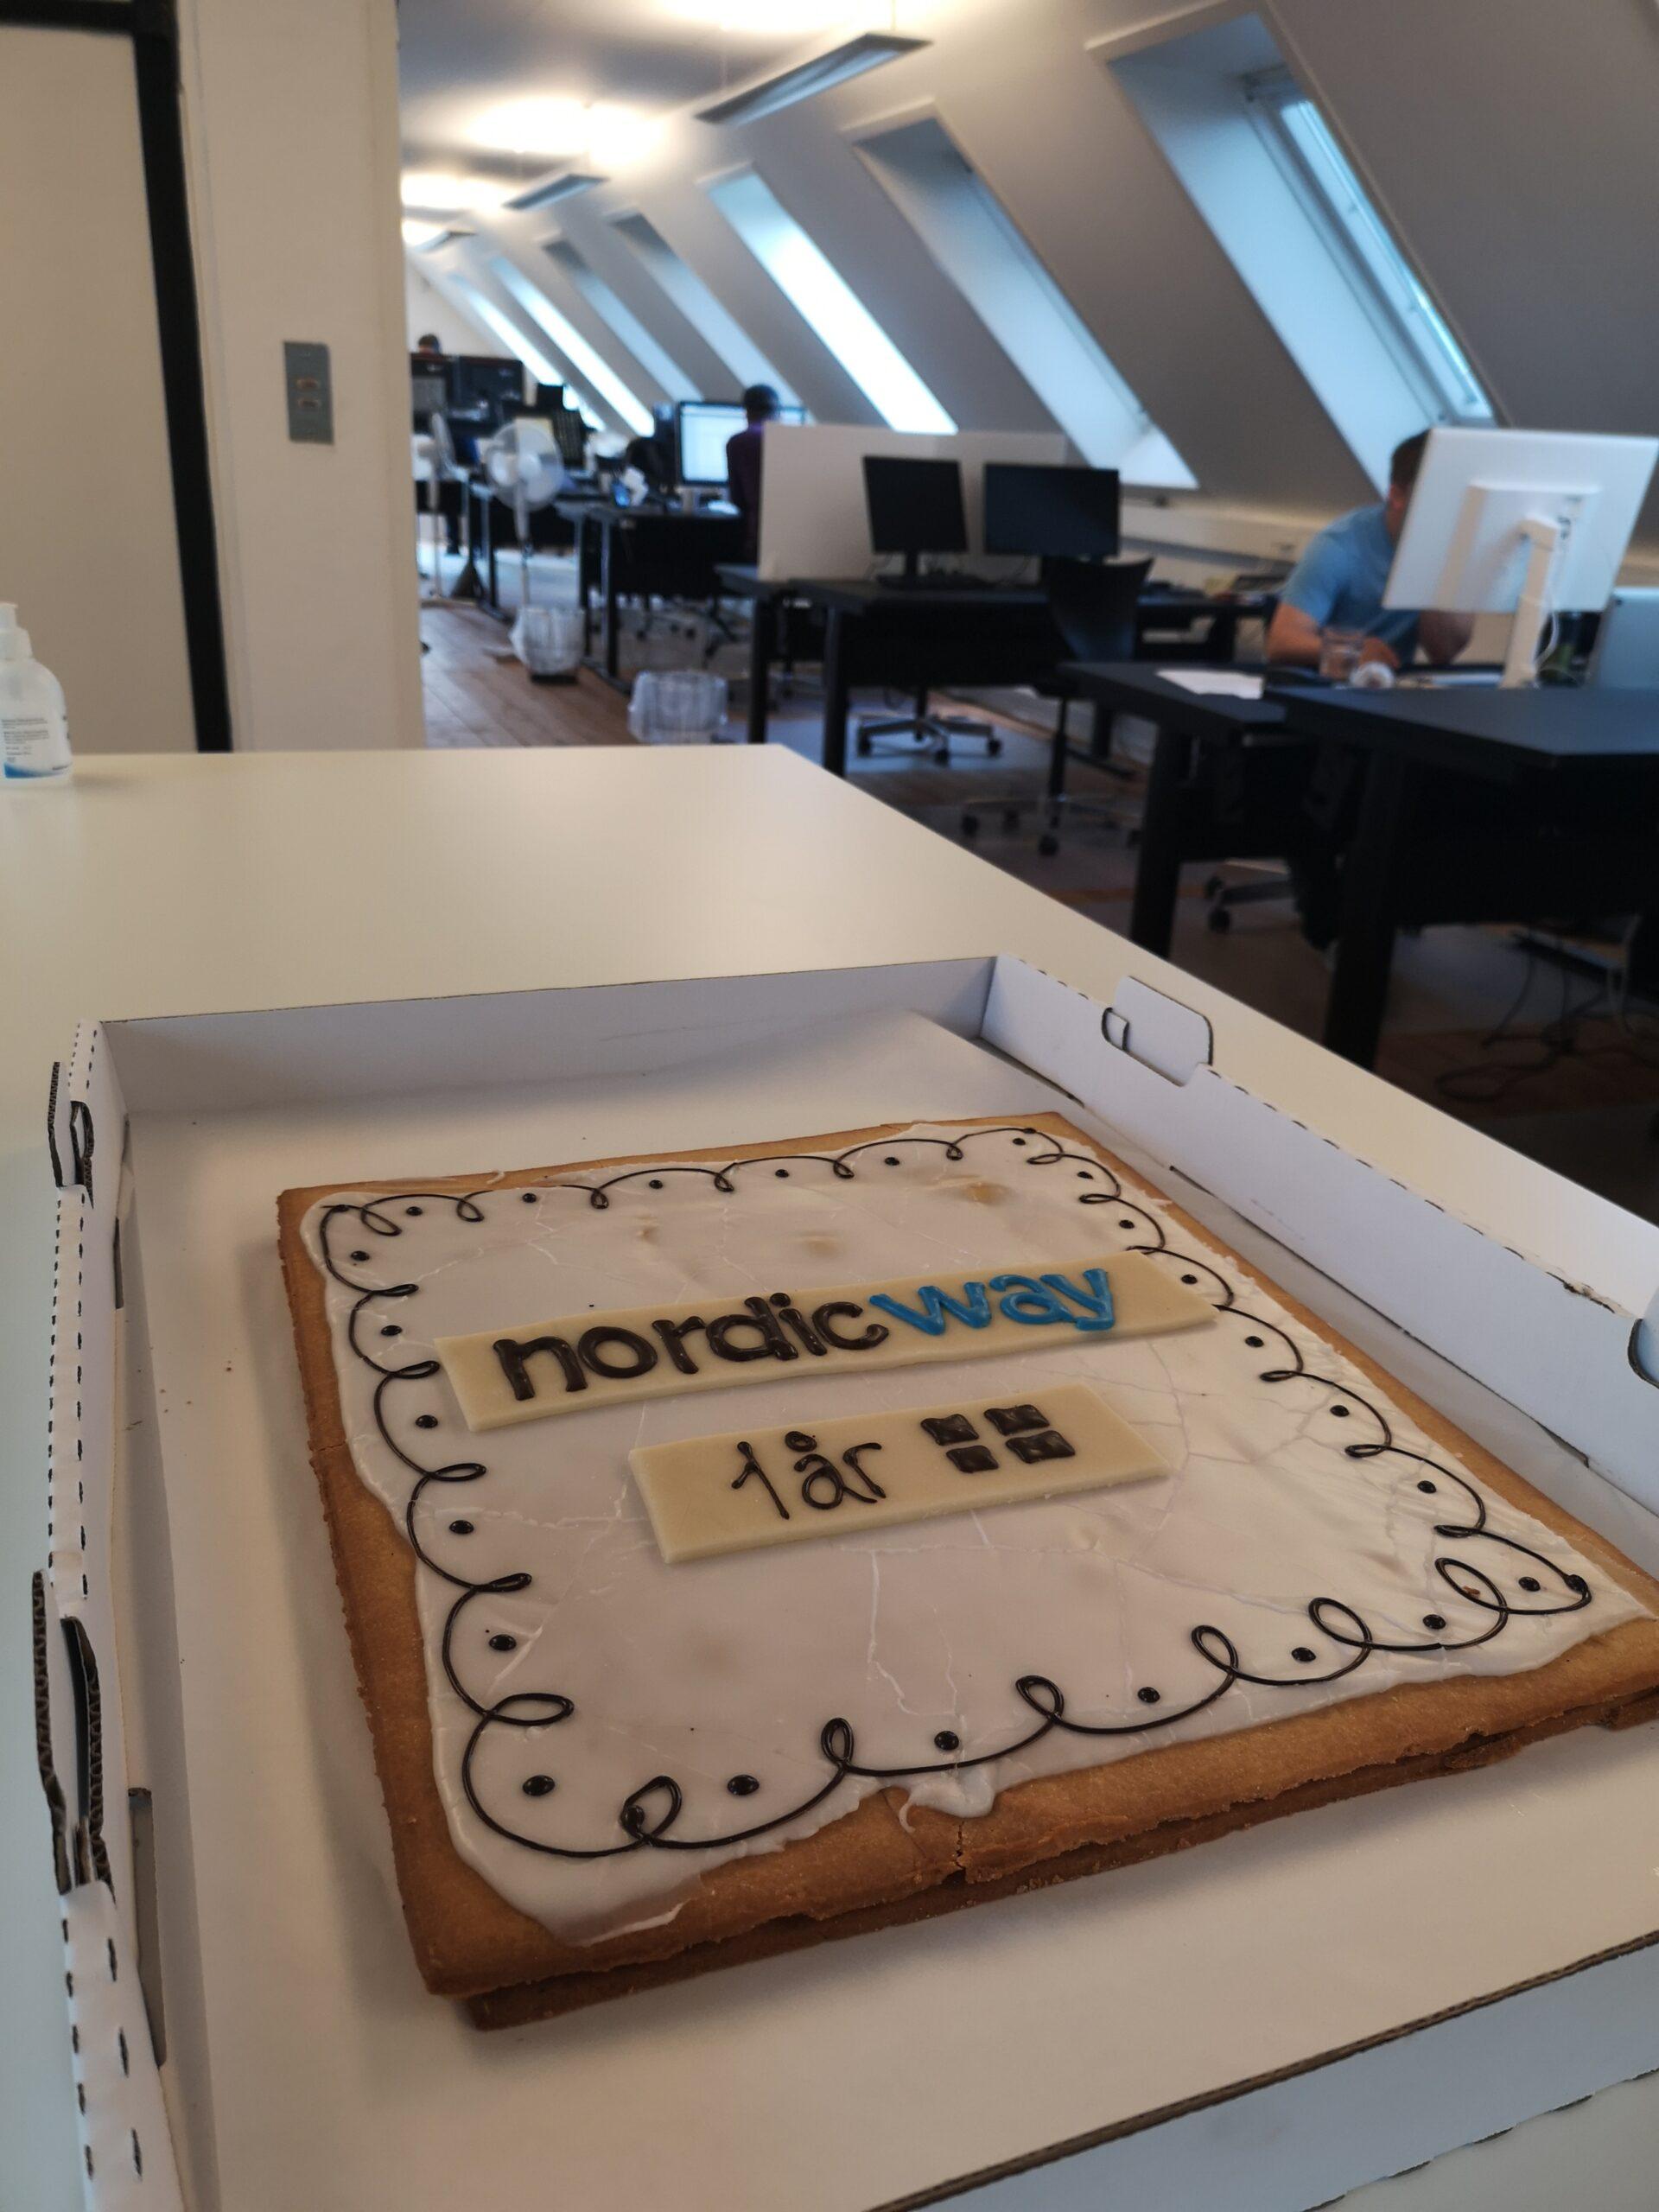 nordicway fylder 1 år!